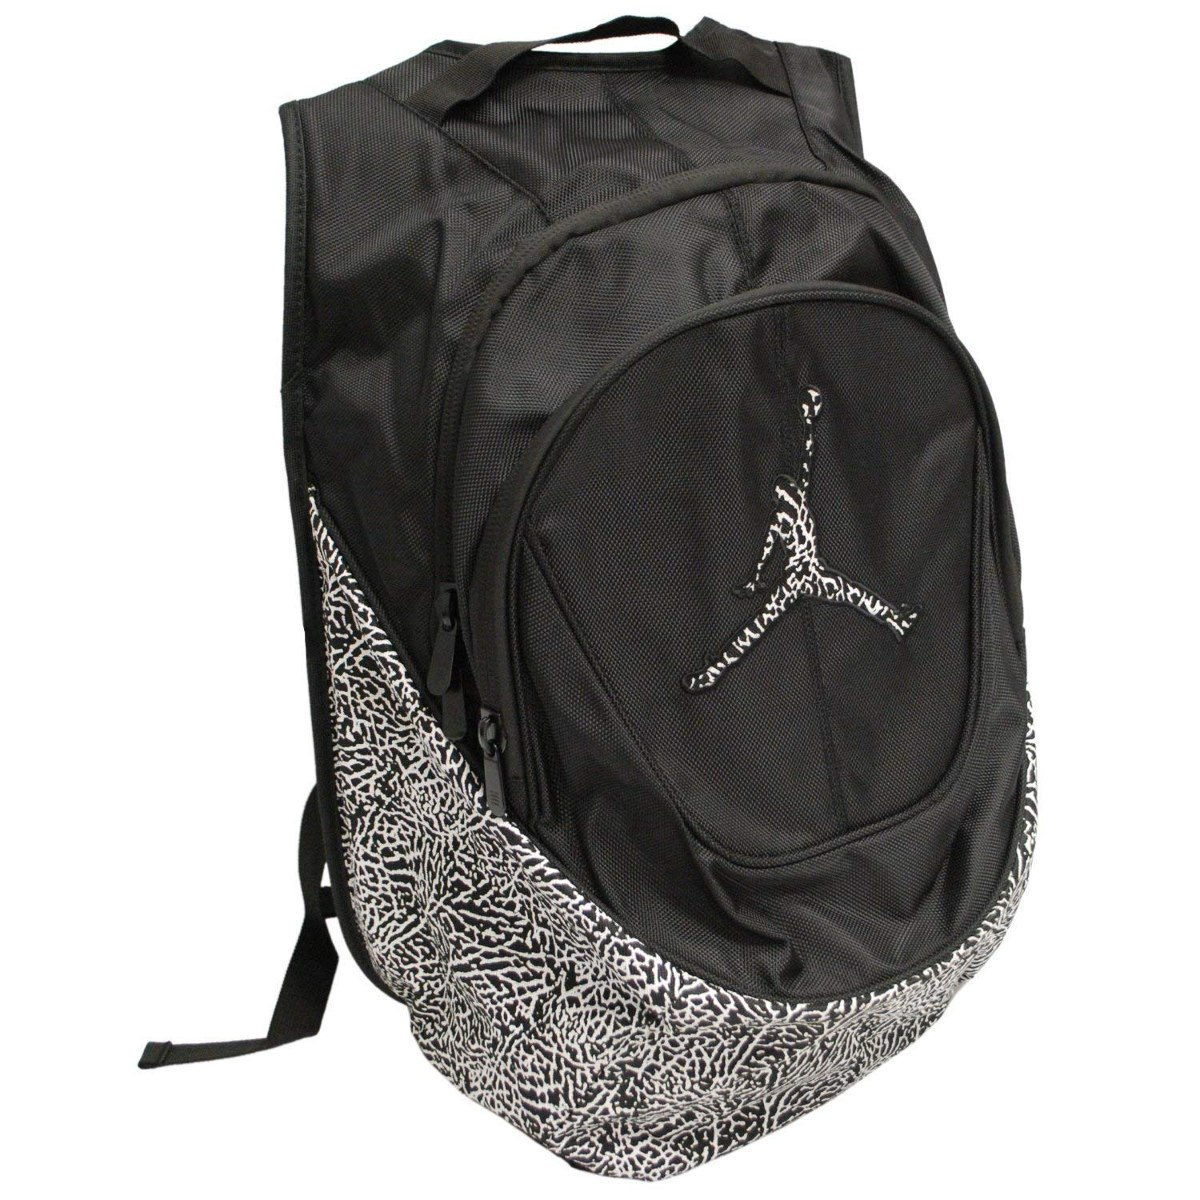 Mochila Nike Air Jordan Jumpman Con Estampado De Elefante ... e2f4caf118655